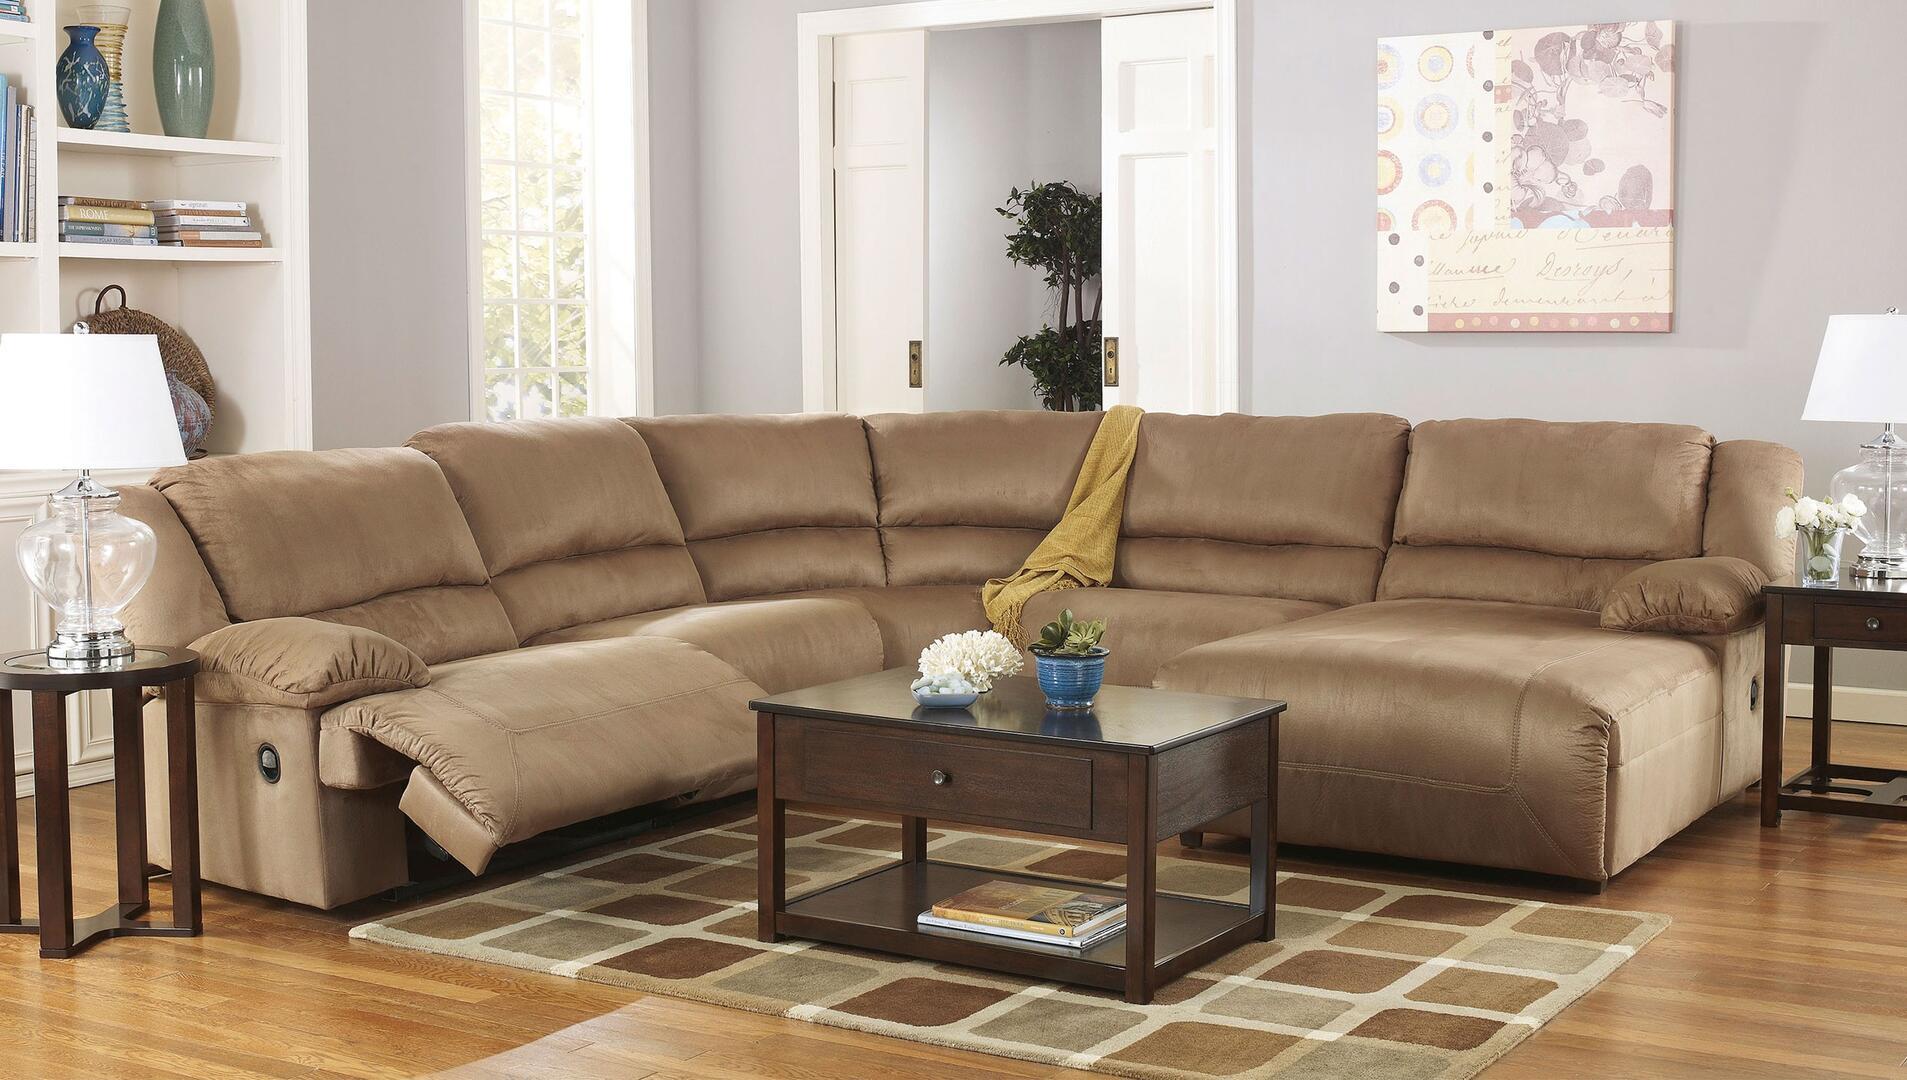 ashley furniture morandi mocha sofa sofas in san antonio signature design by 578025pcsecl hogan series